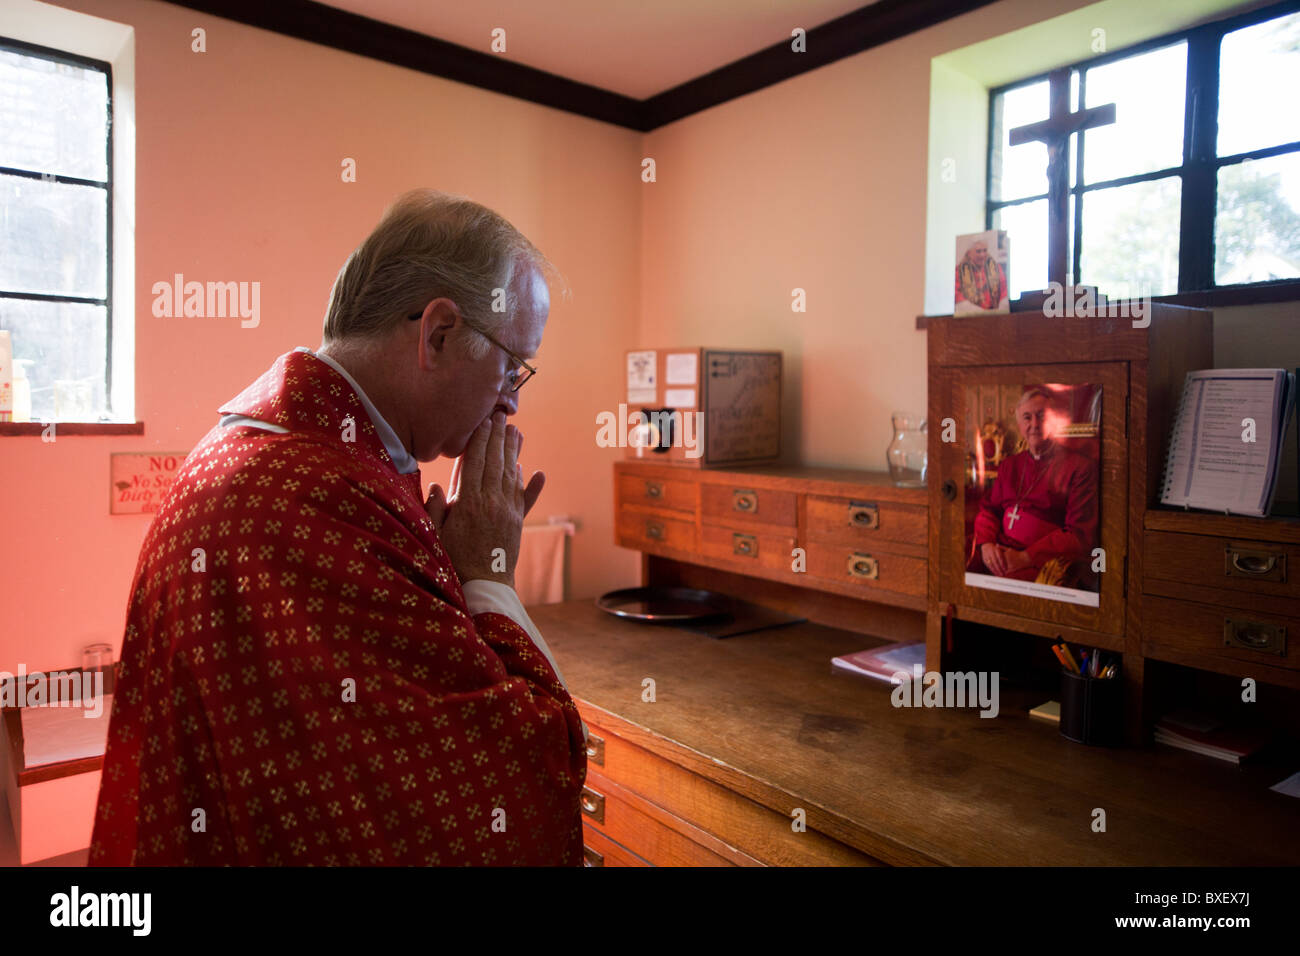 Priest says brief prayer in backroom sacristy vestry before mass priest says brief prayer in backroom sacristy vestry before mass at st lawrences catholic church in feltham london altavistaventures Gallery